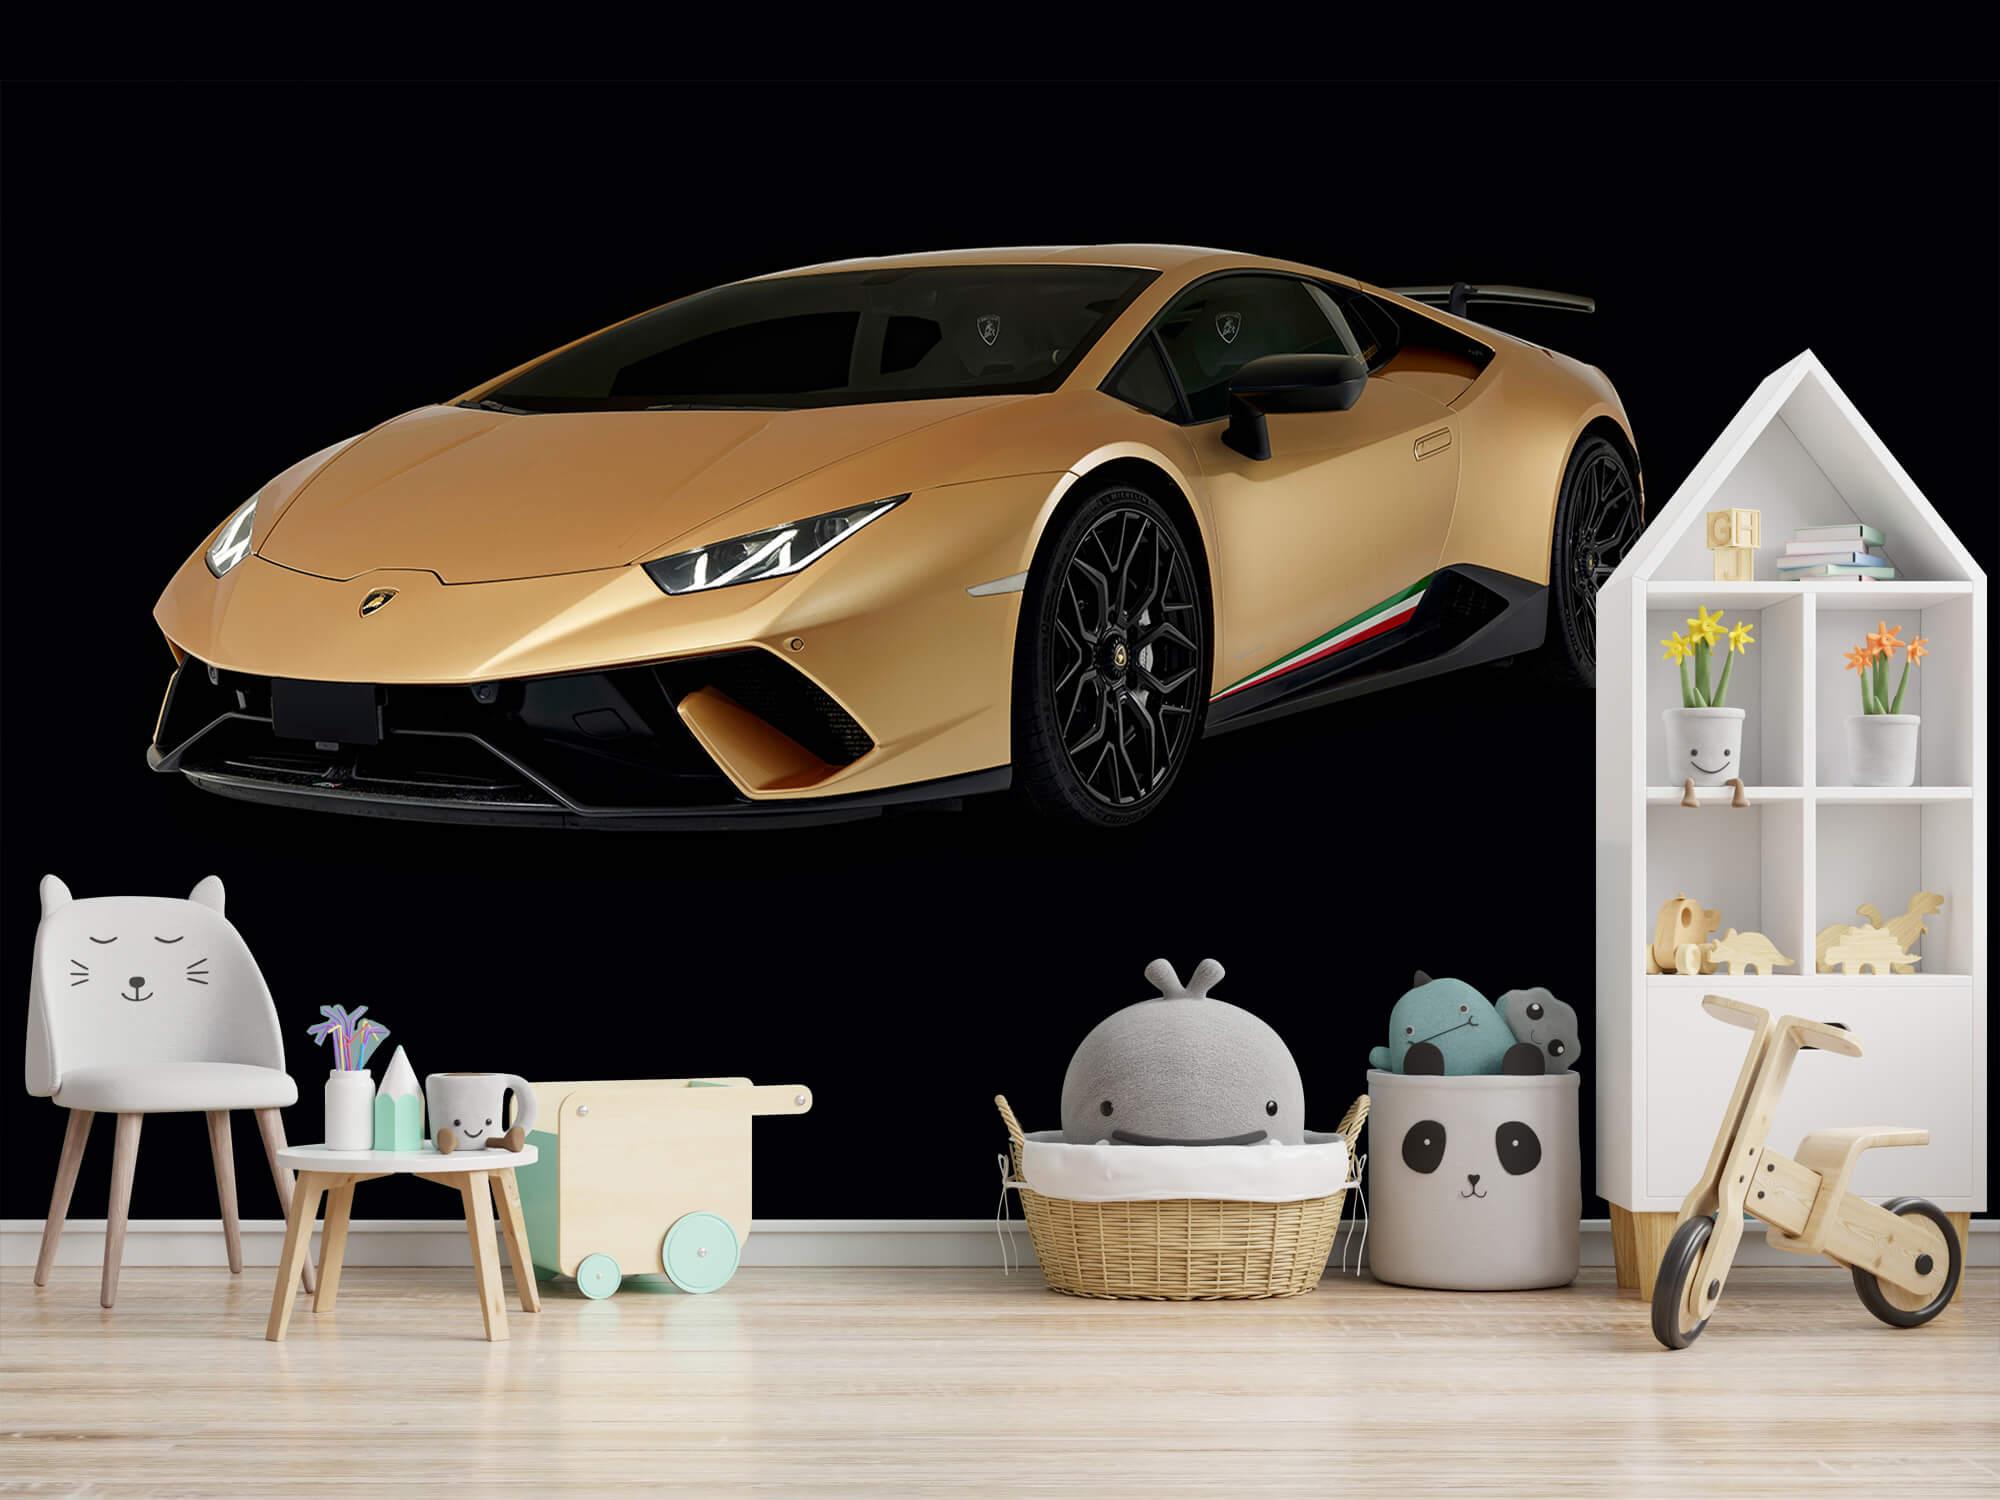 Wallpaper Lamborghini Huracán - Avant droit, noir 2